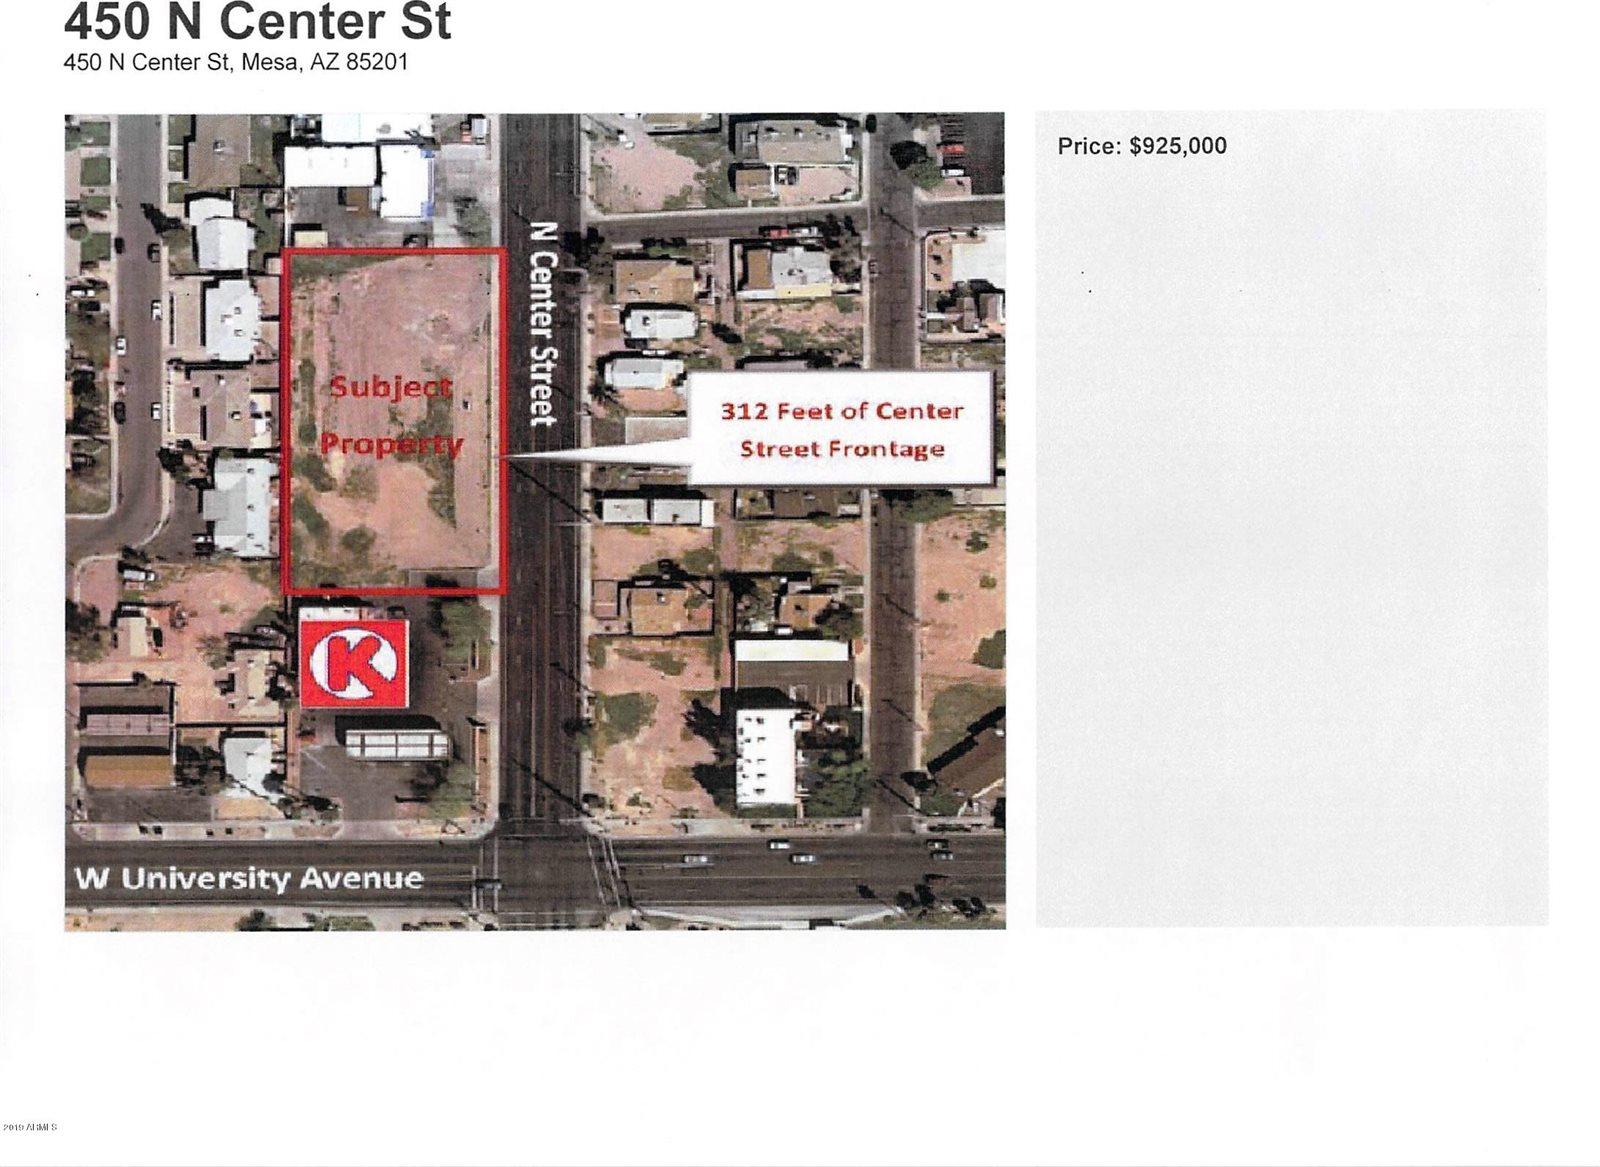 450 North Center Street, Mesa, AZ 85201